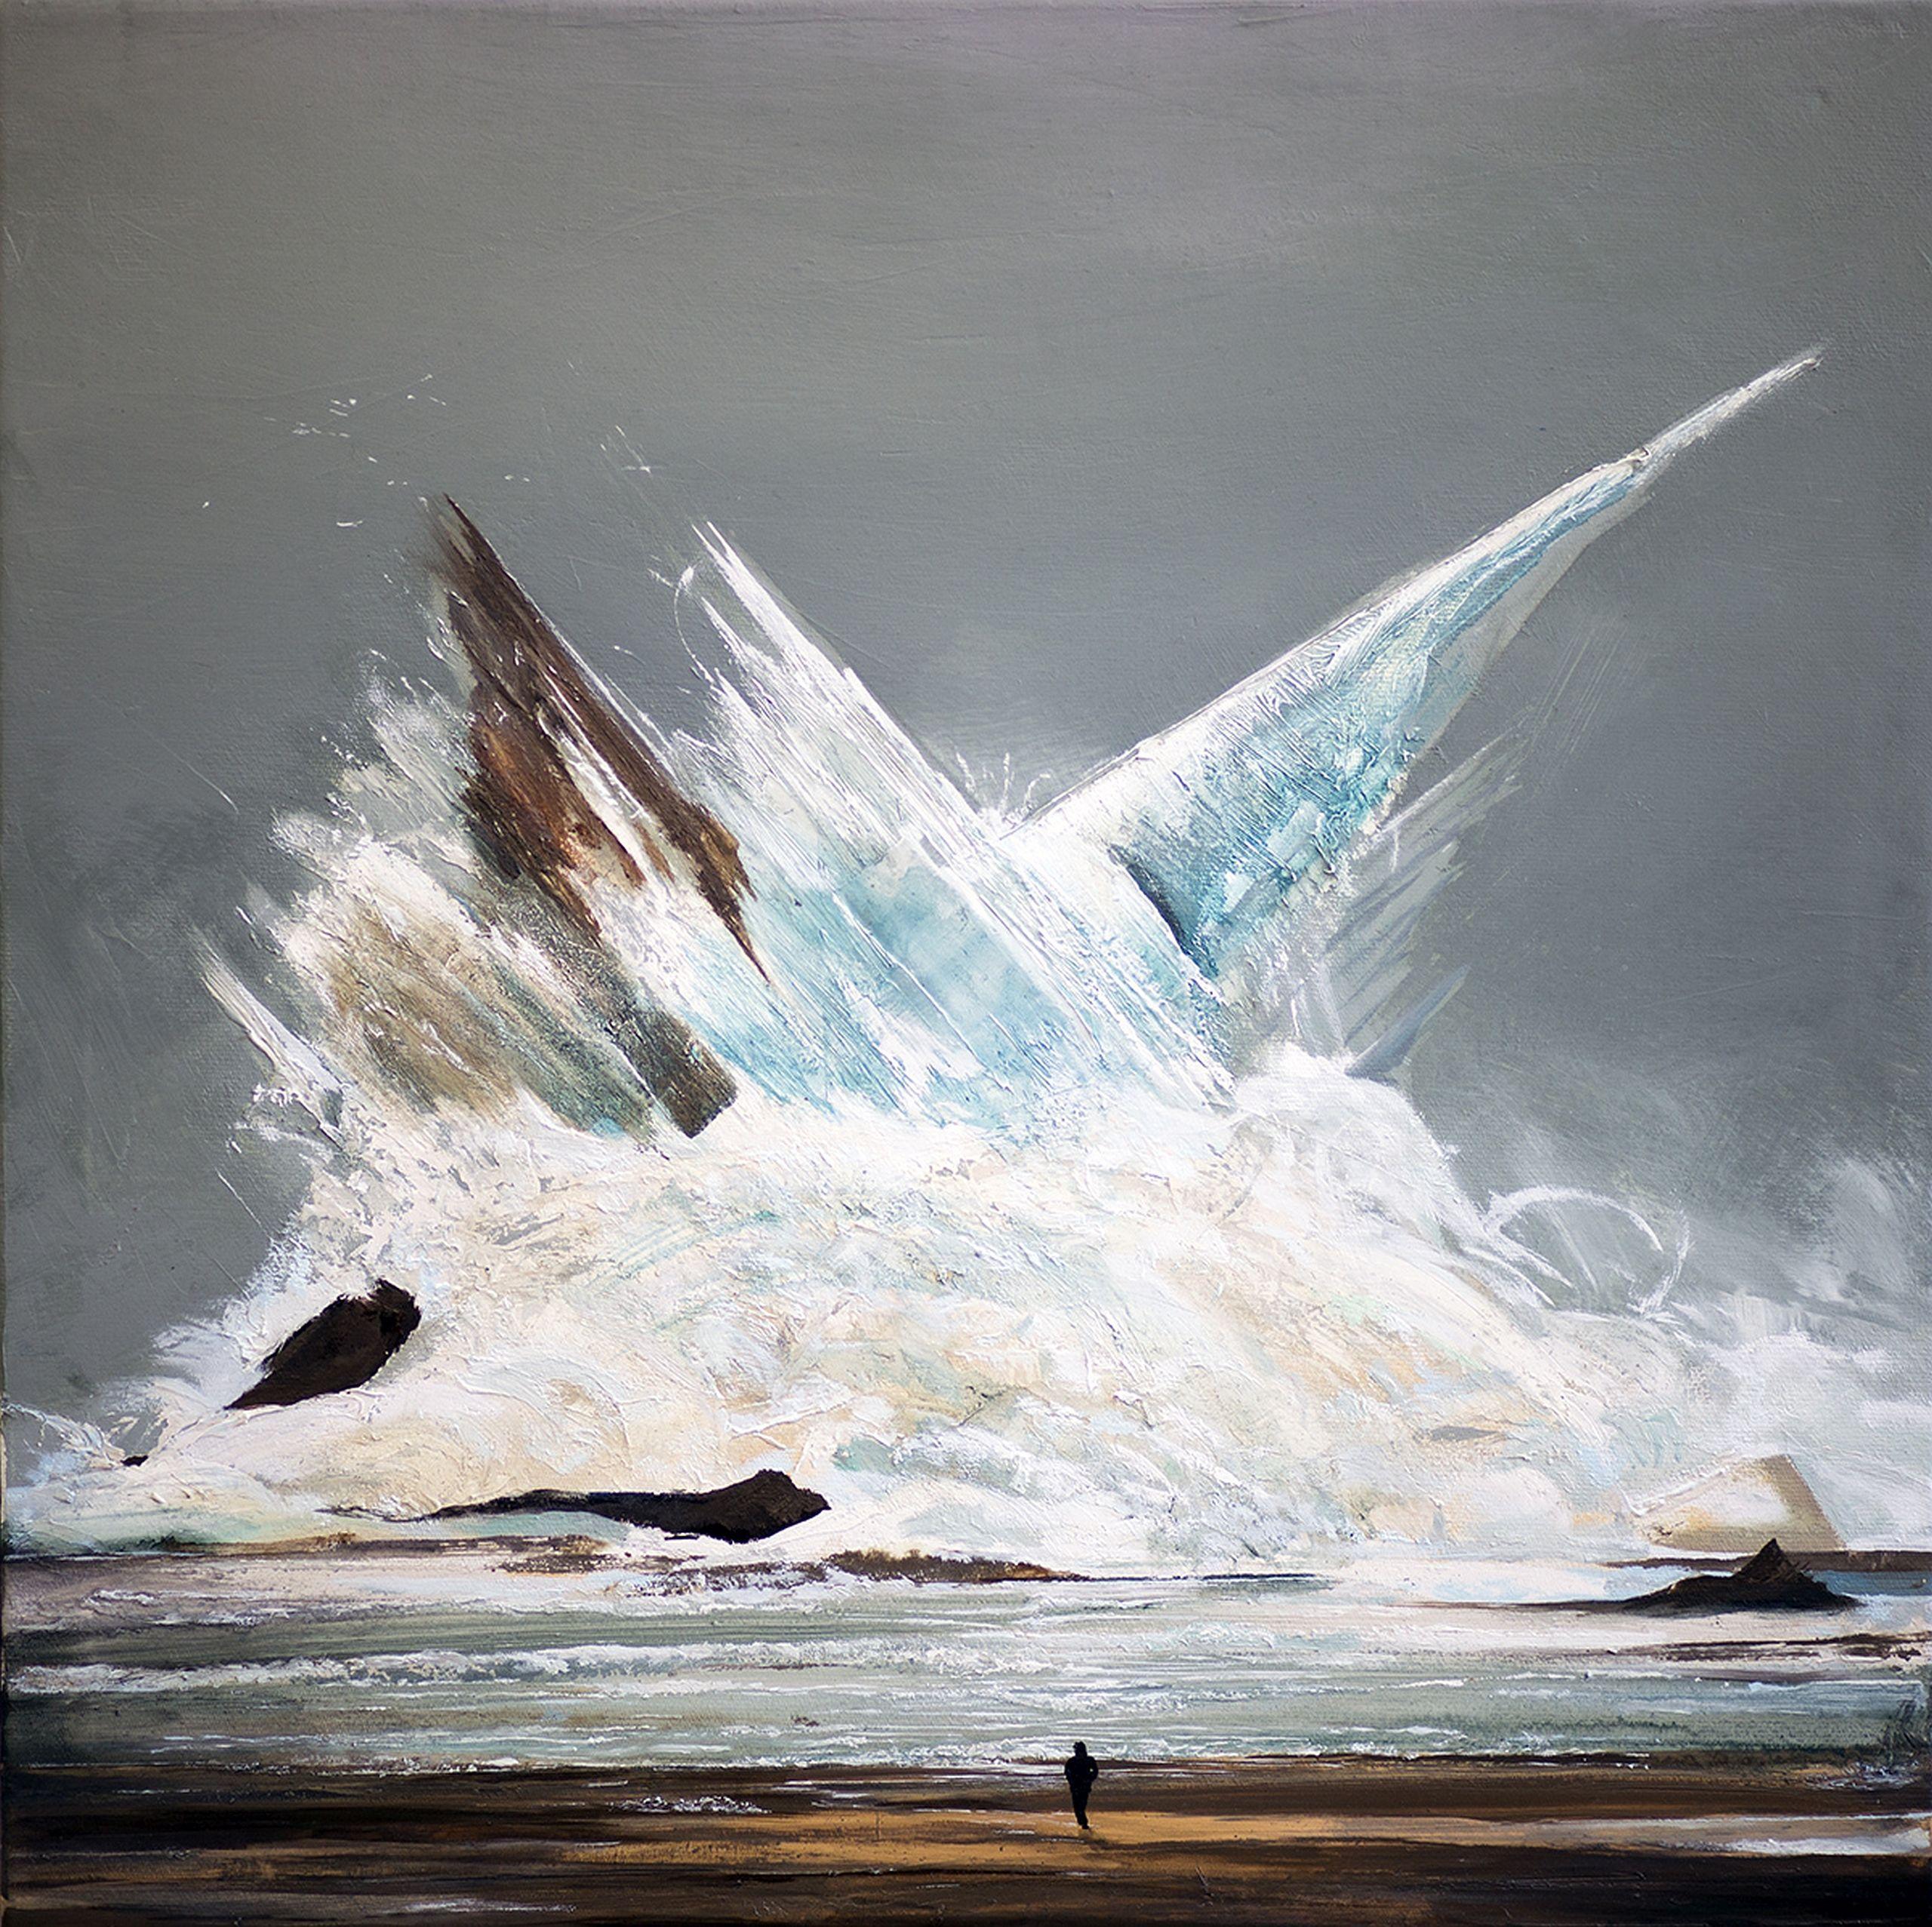 Total breakdown, Painting, Oil on Canvas